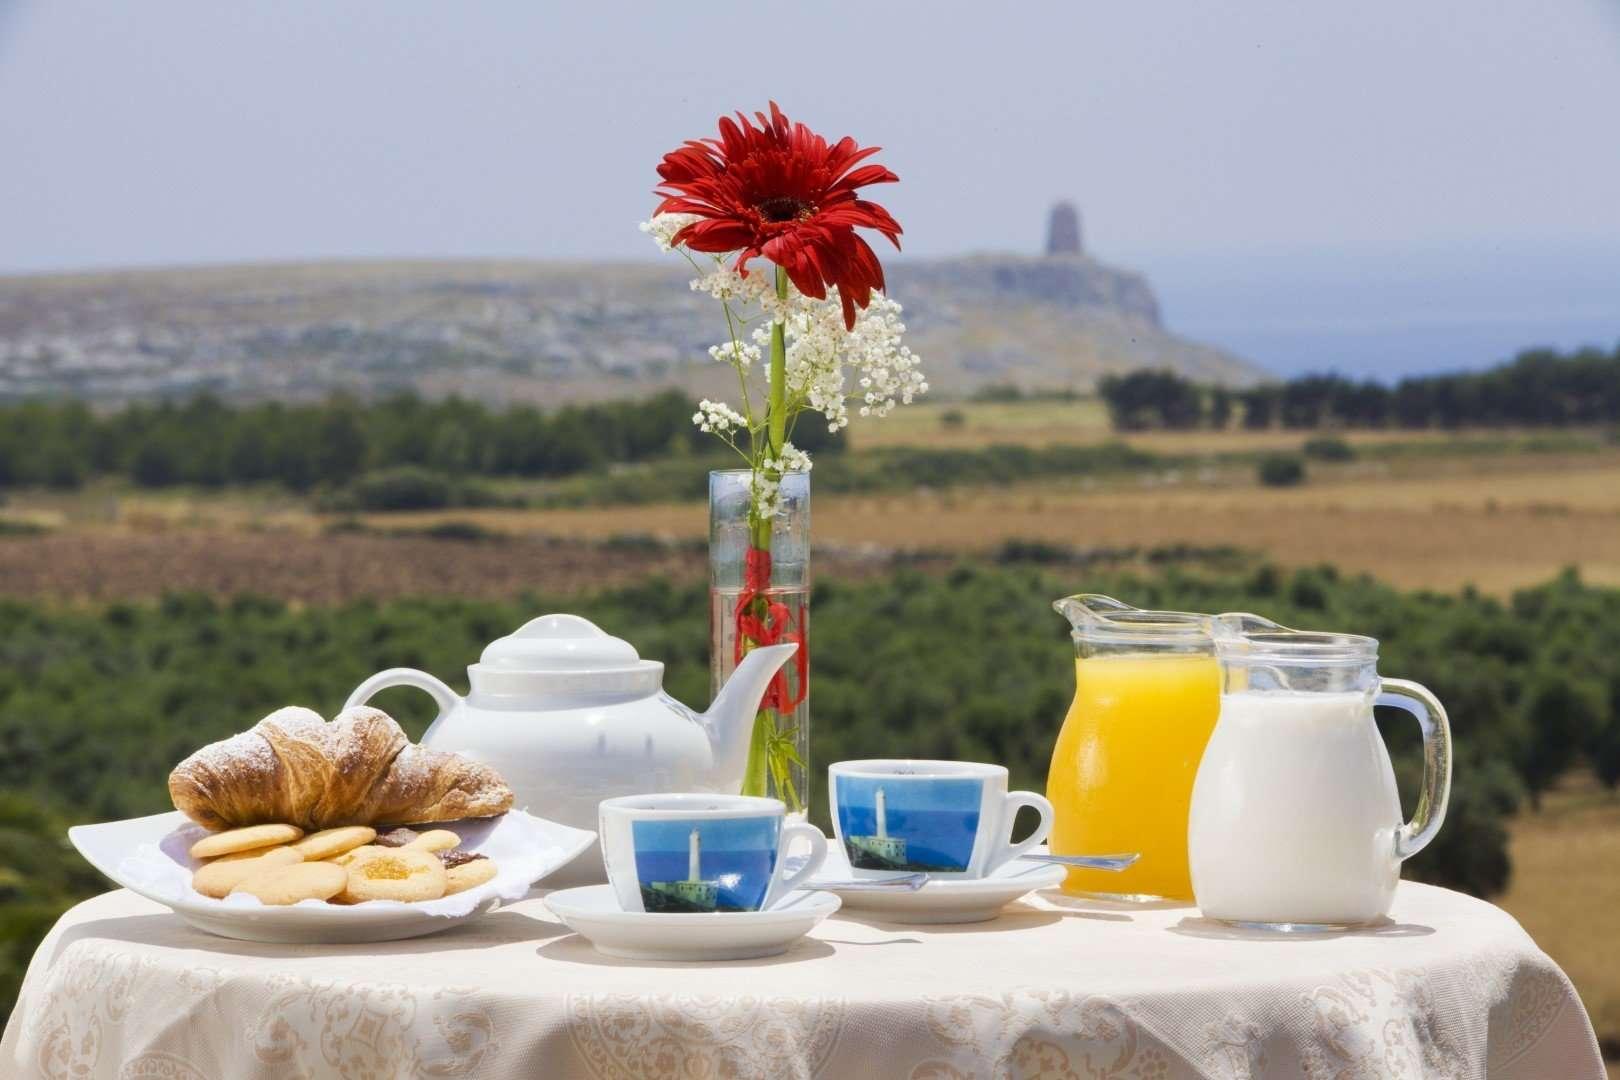 masseria_panareo_puglia_italie_ontbijtje